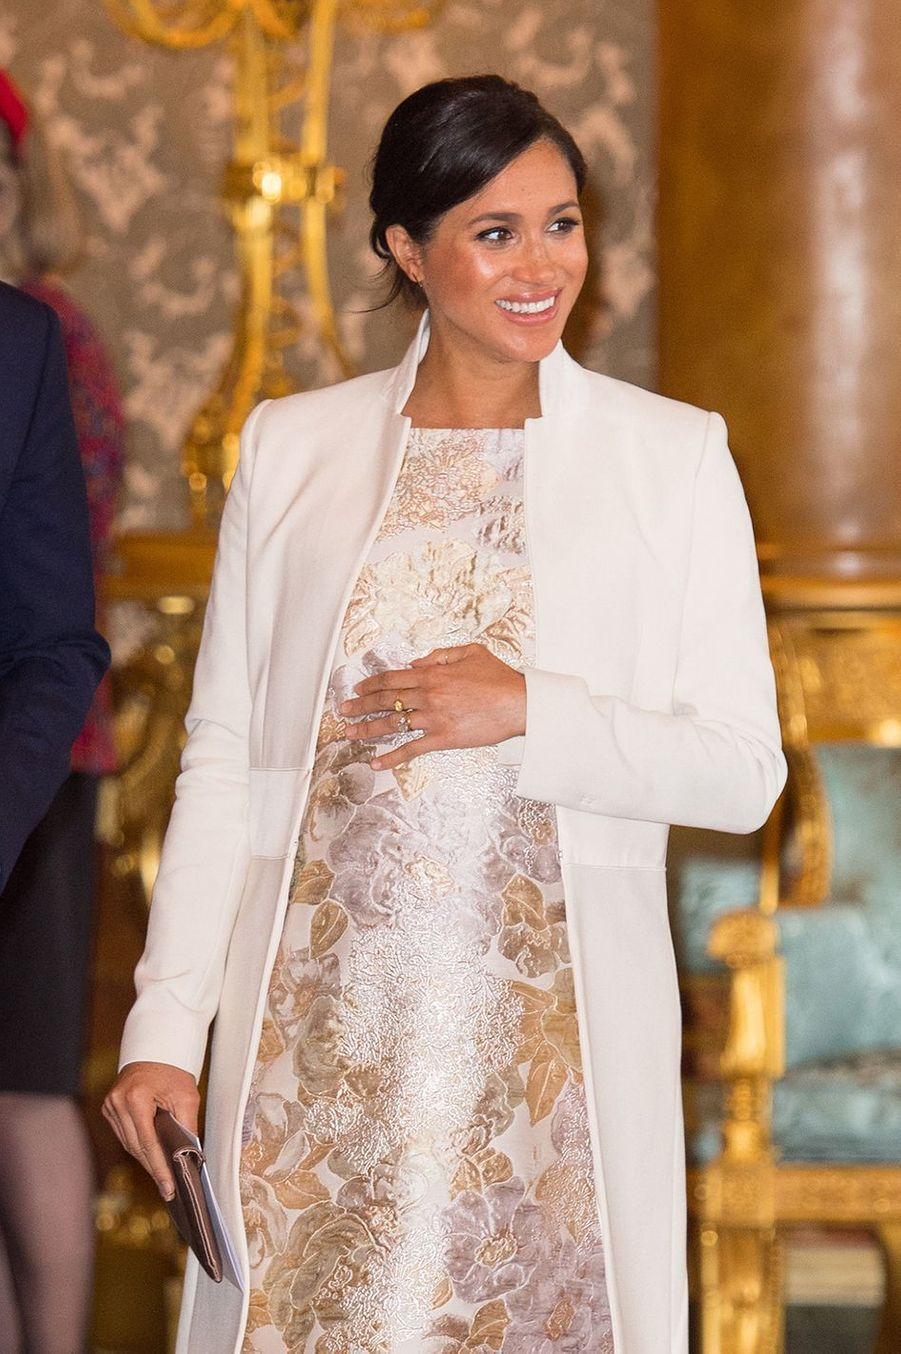 Meghan Markle enAmanda Wakeley à Buckingham Palace, le 5 mars 2019